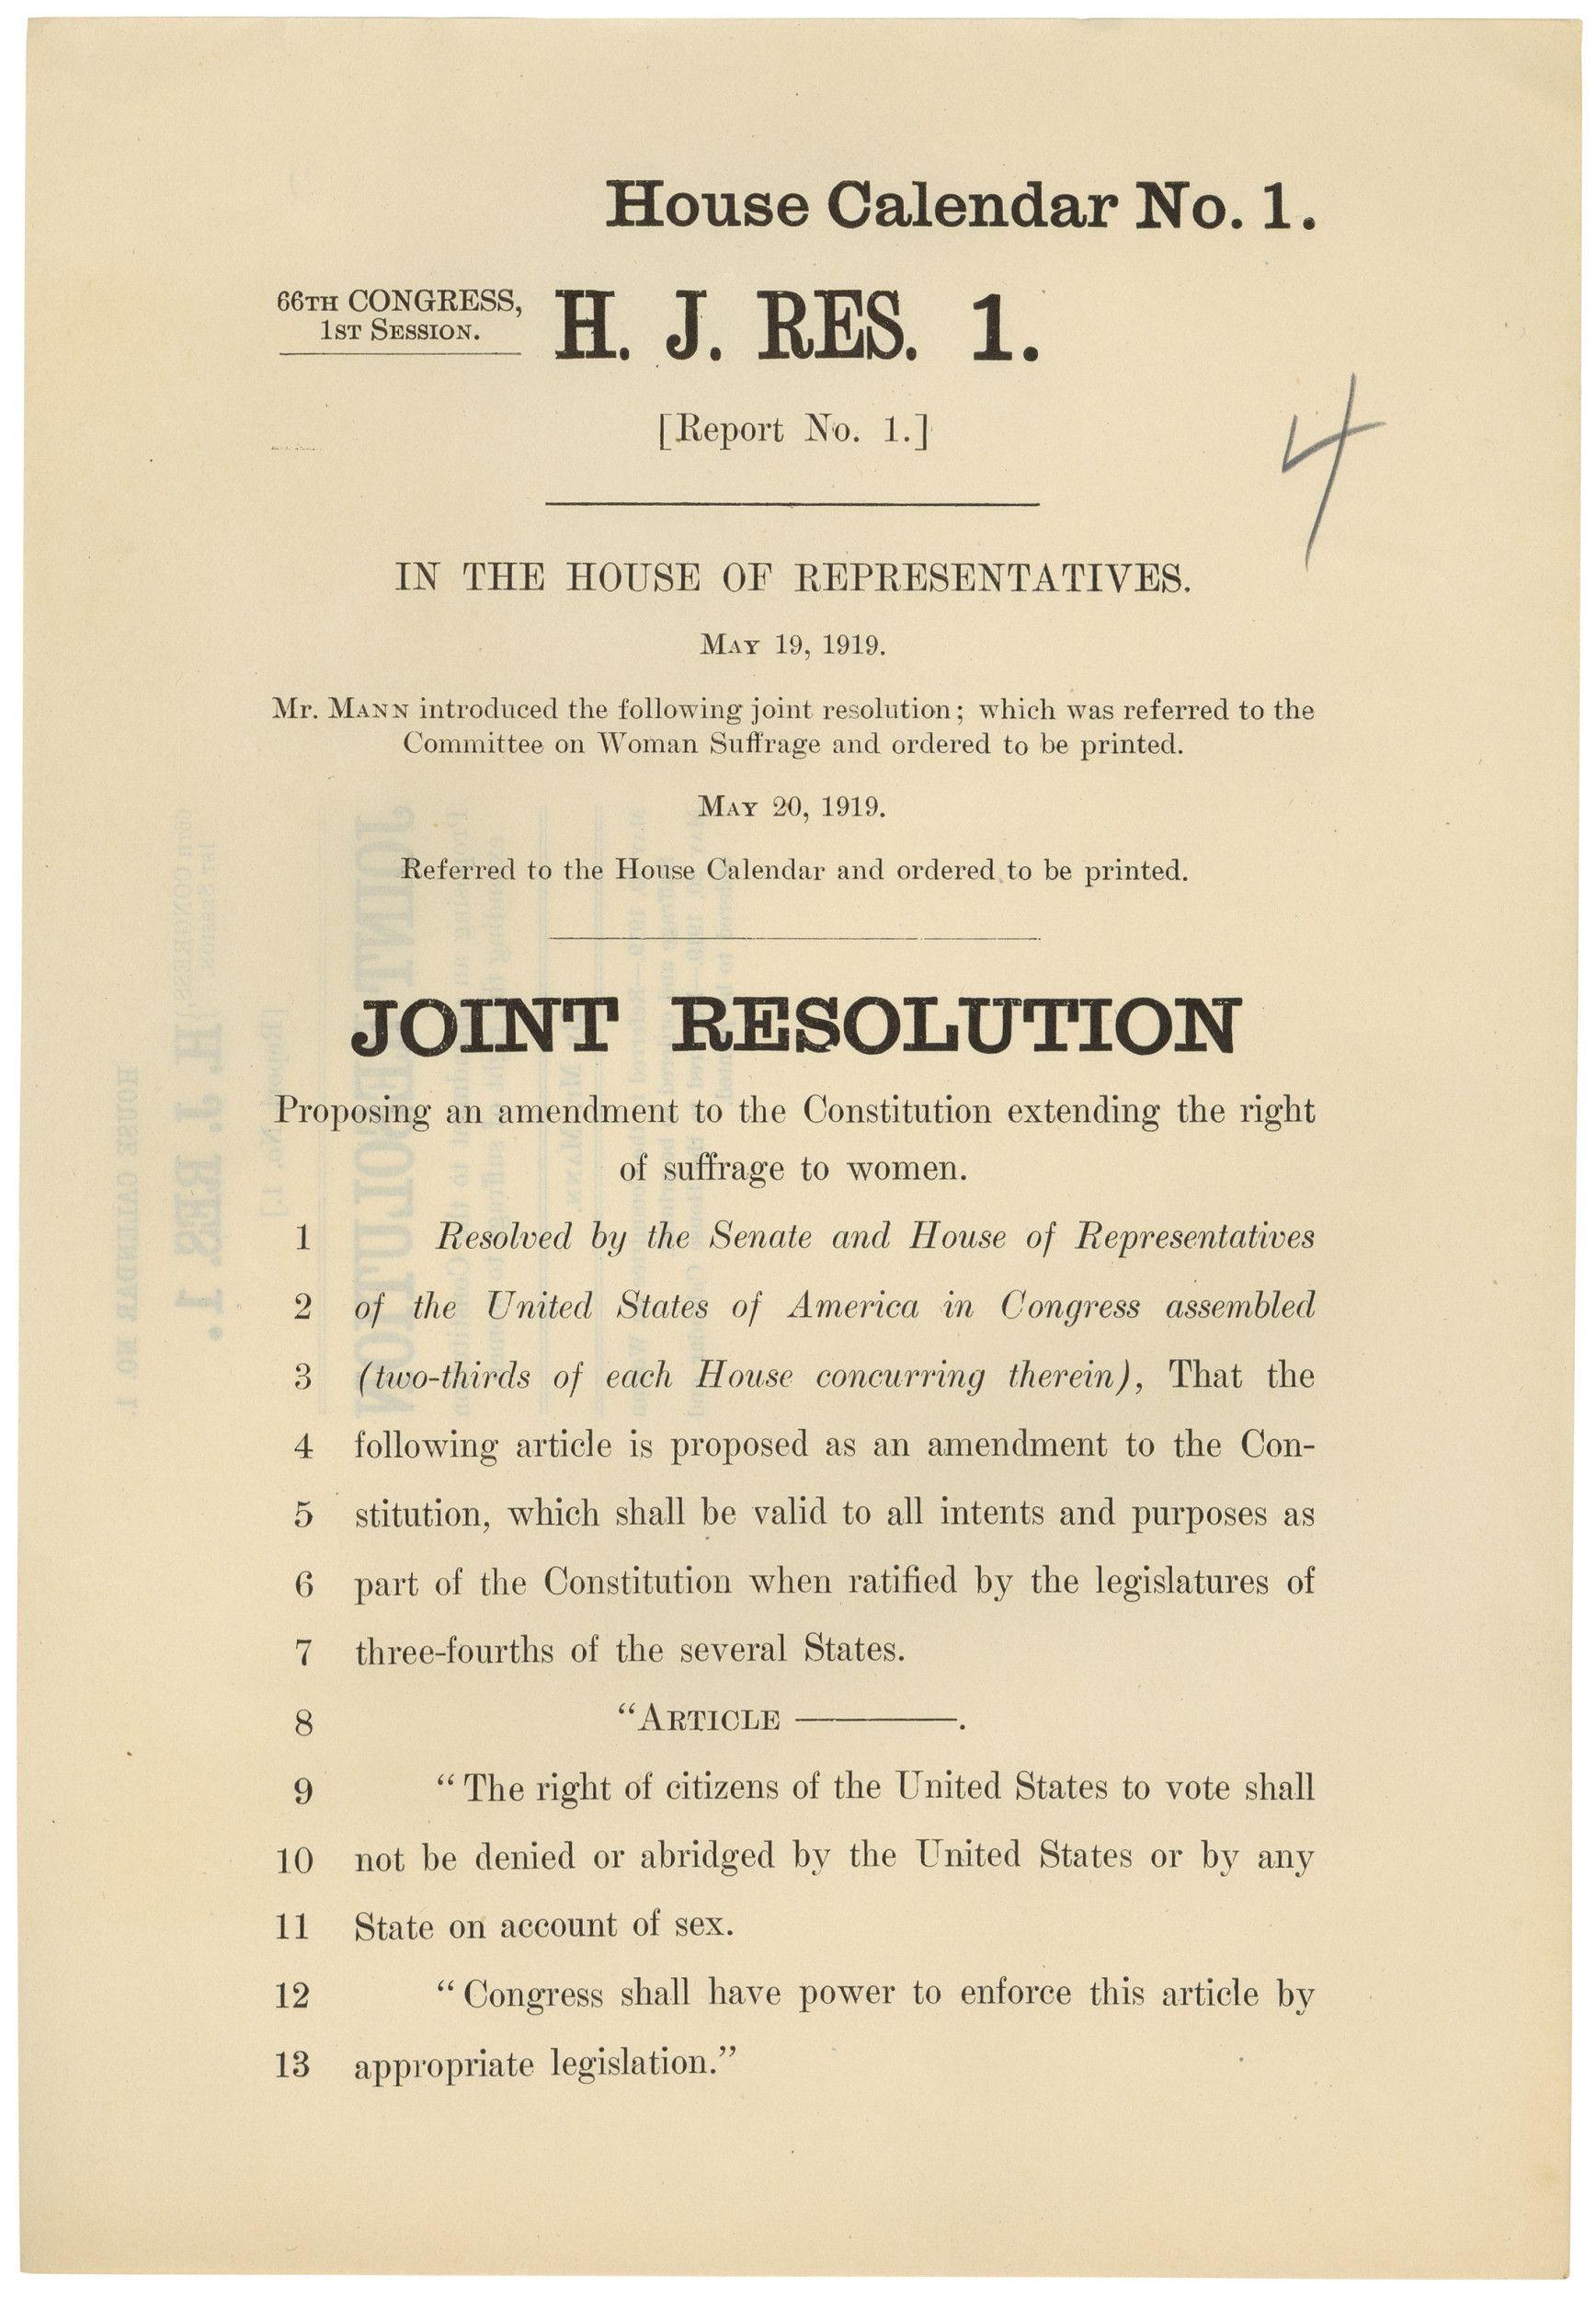 House Joint Resolution Regarding the 19th Amendment